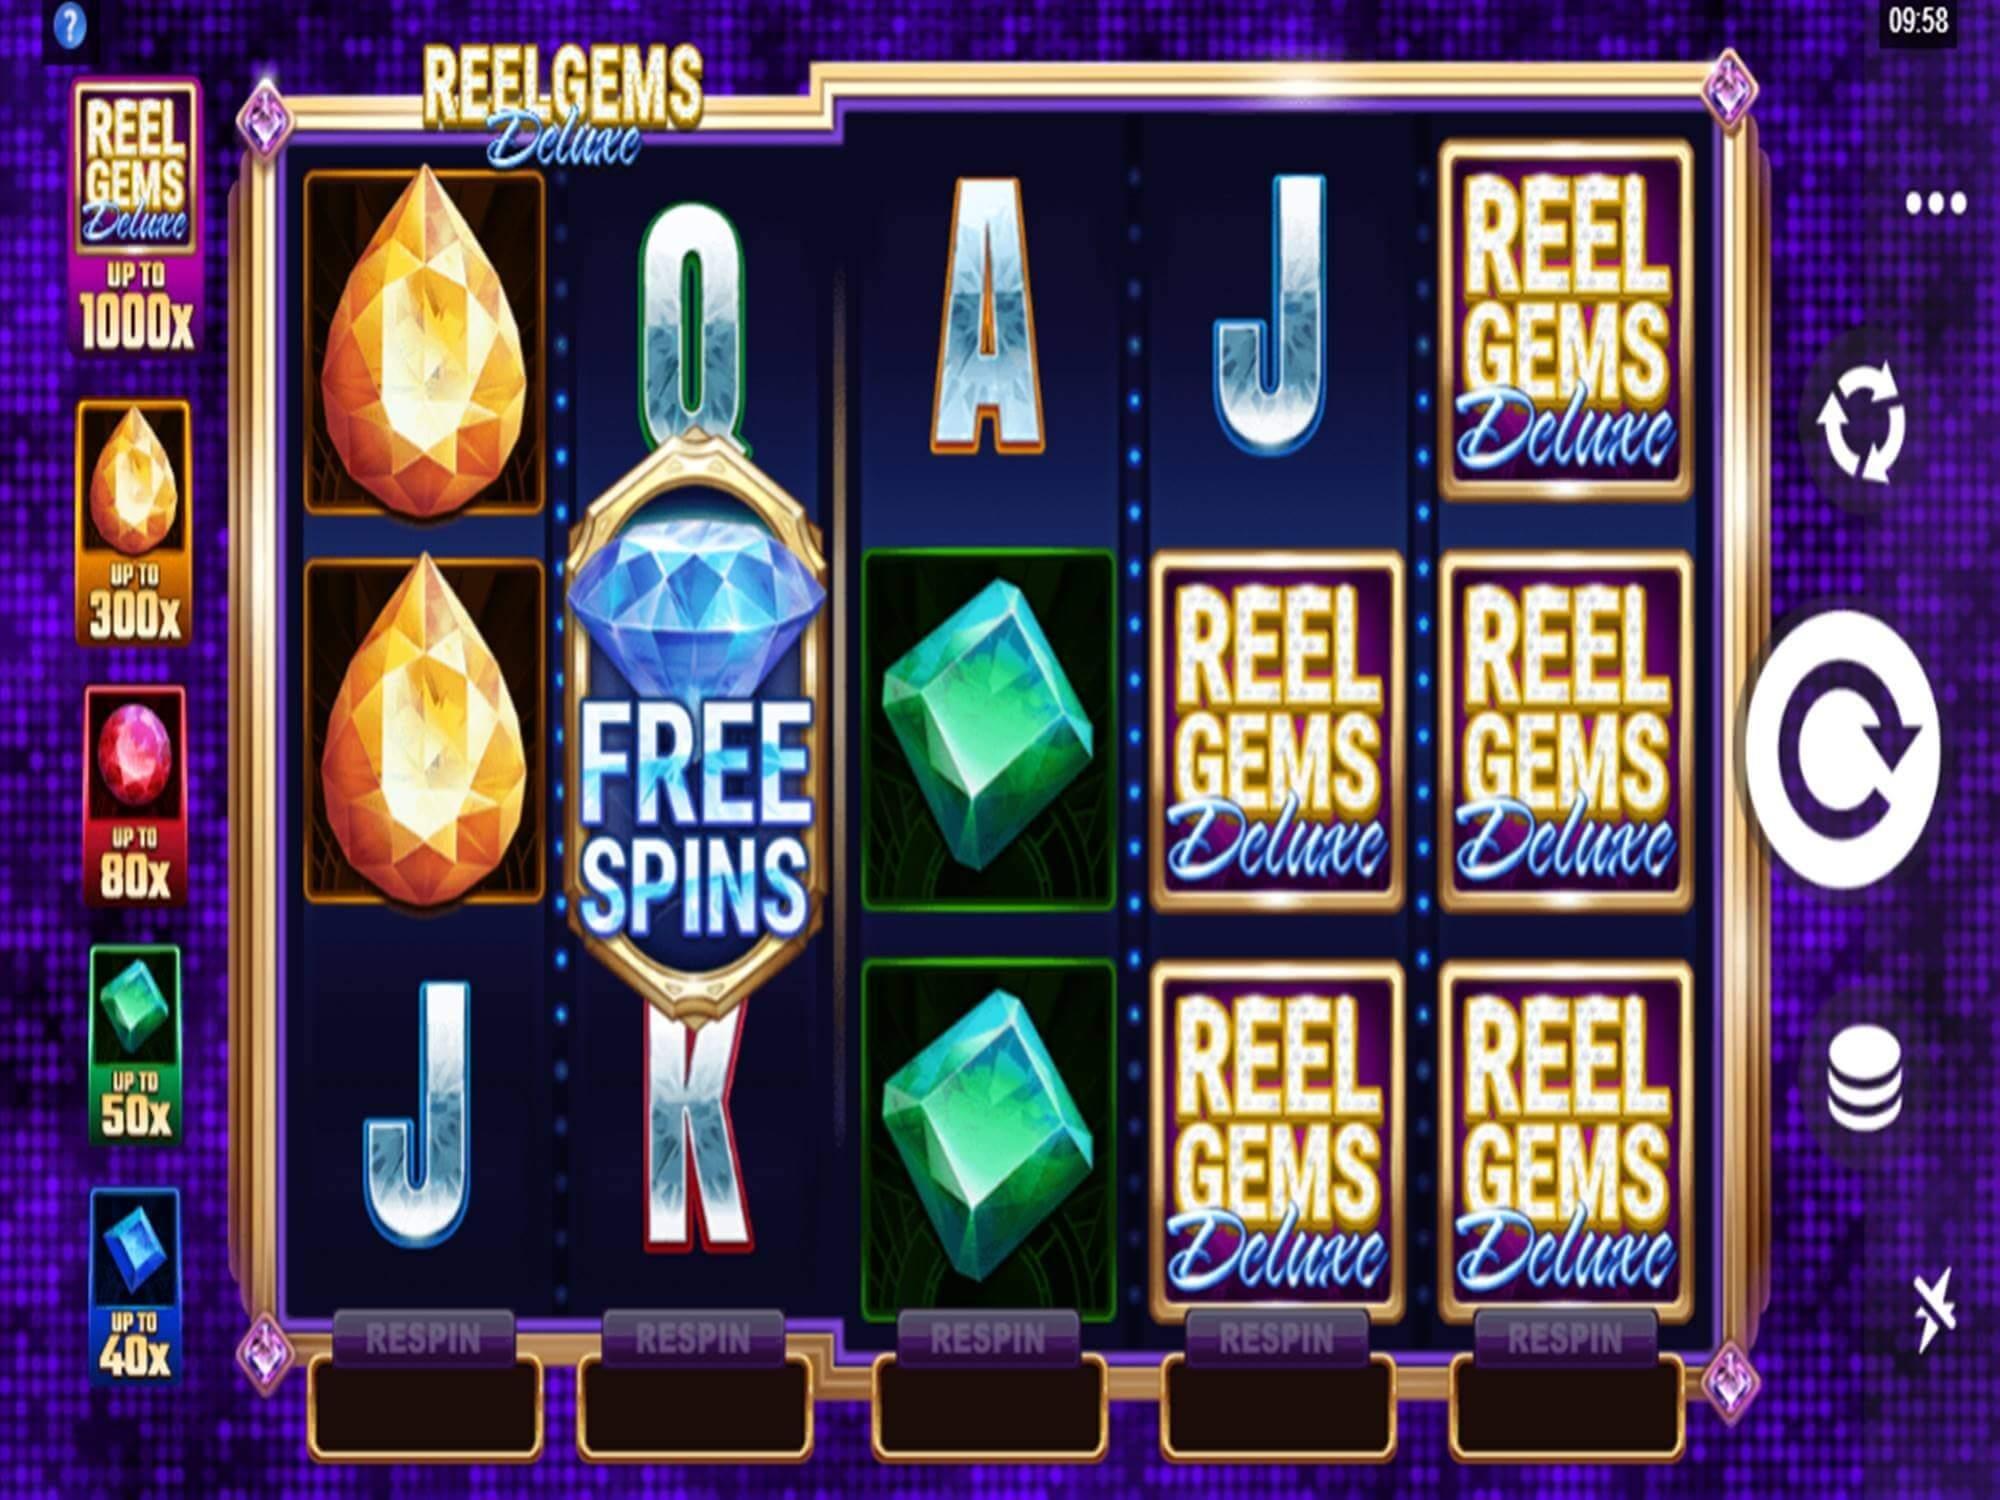 Reel Gems Deluxe Slot Gameplay